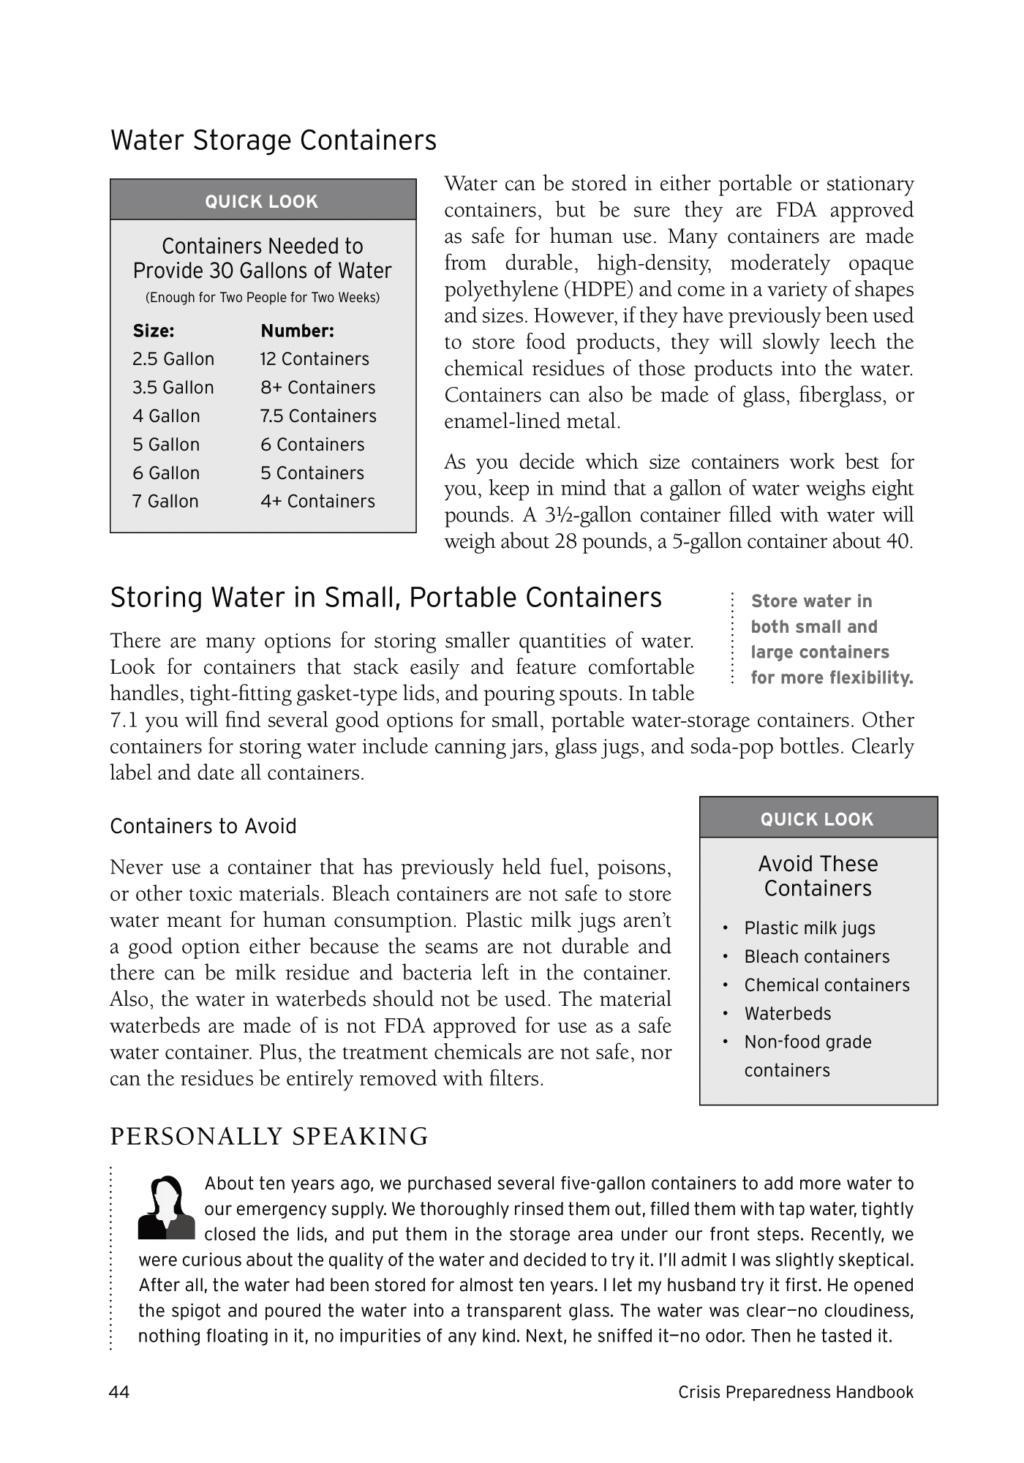 Crisis Preparedness Handbook